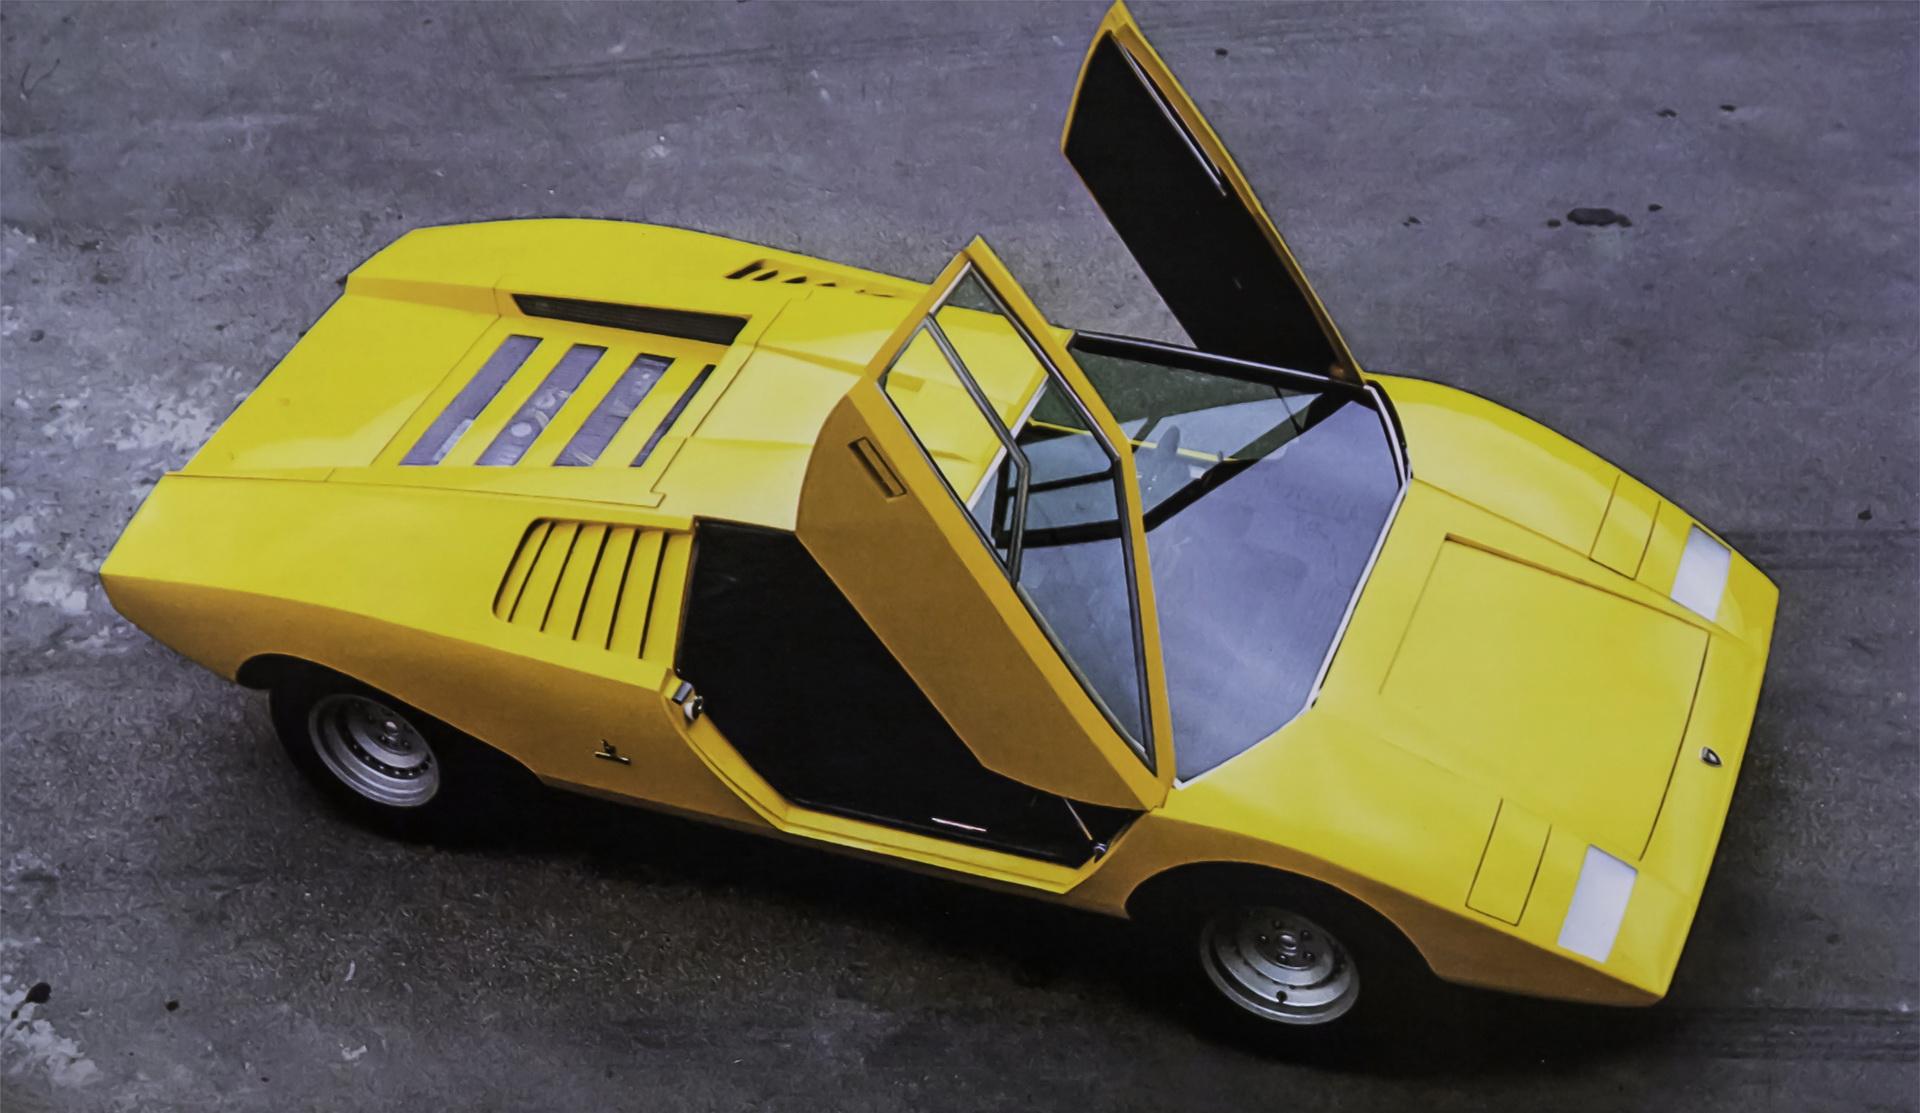 Lamborghini-Countach-LP500-Prototype-02.jpg